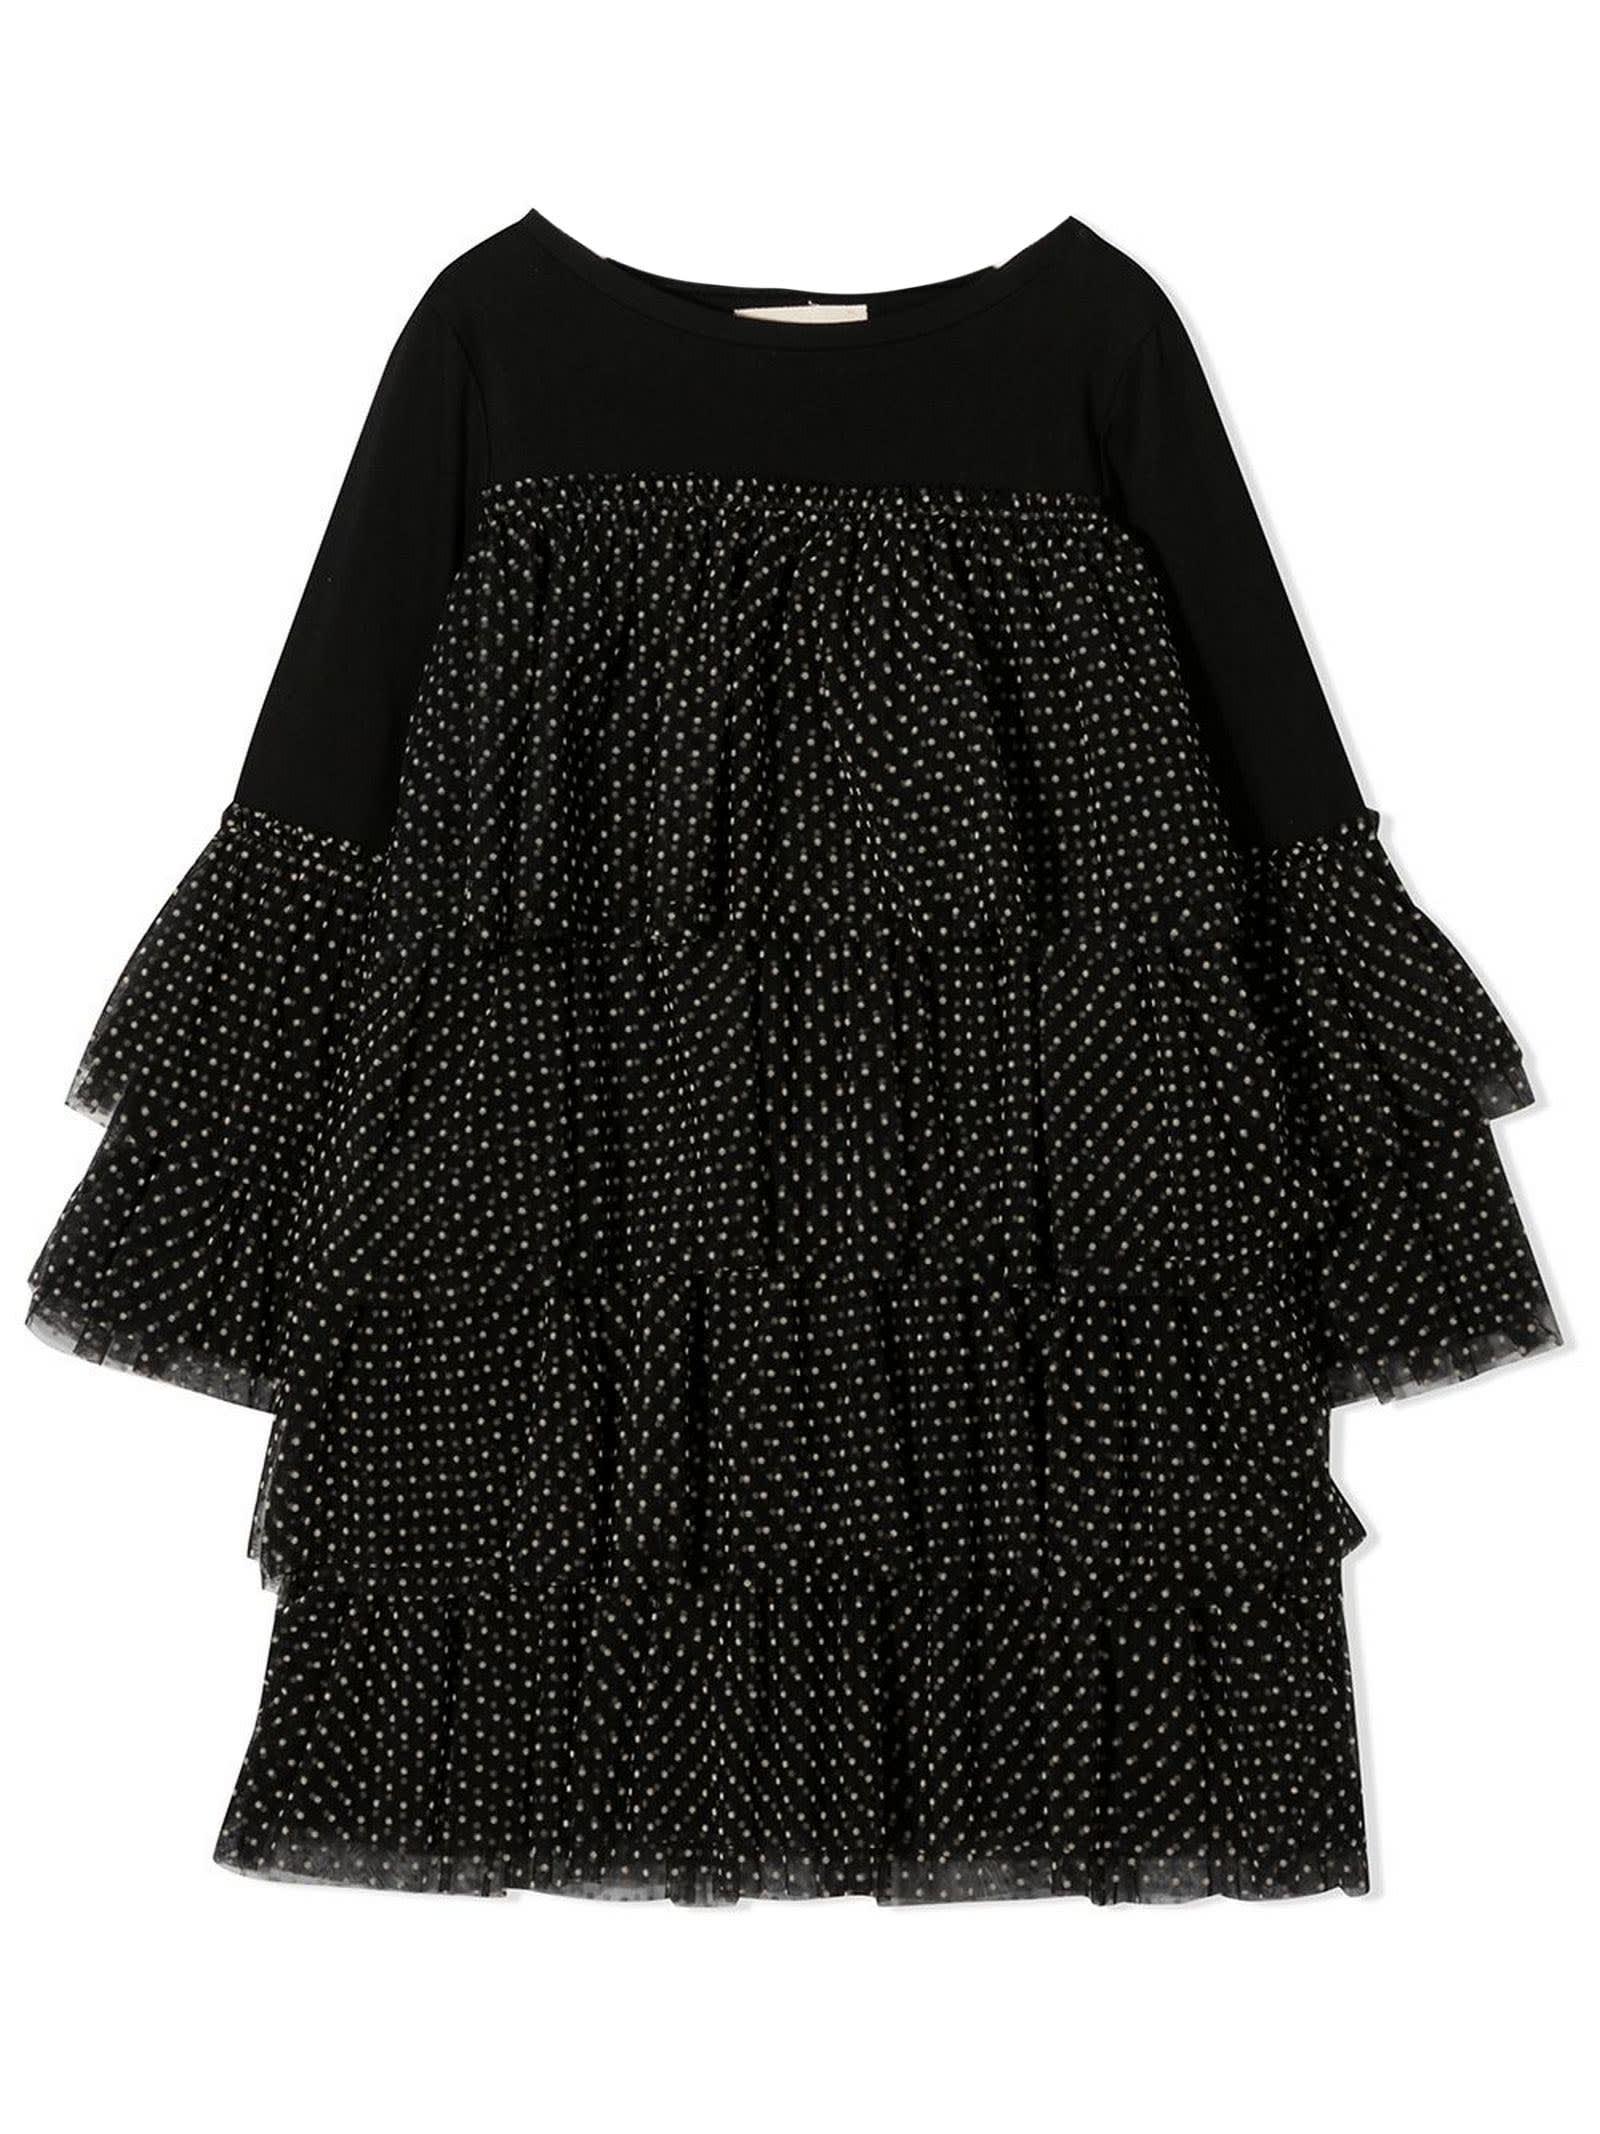 Black Cotton Ruffled Dress